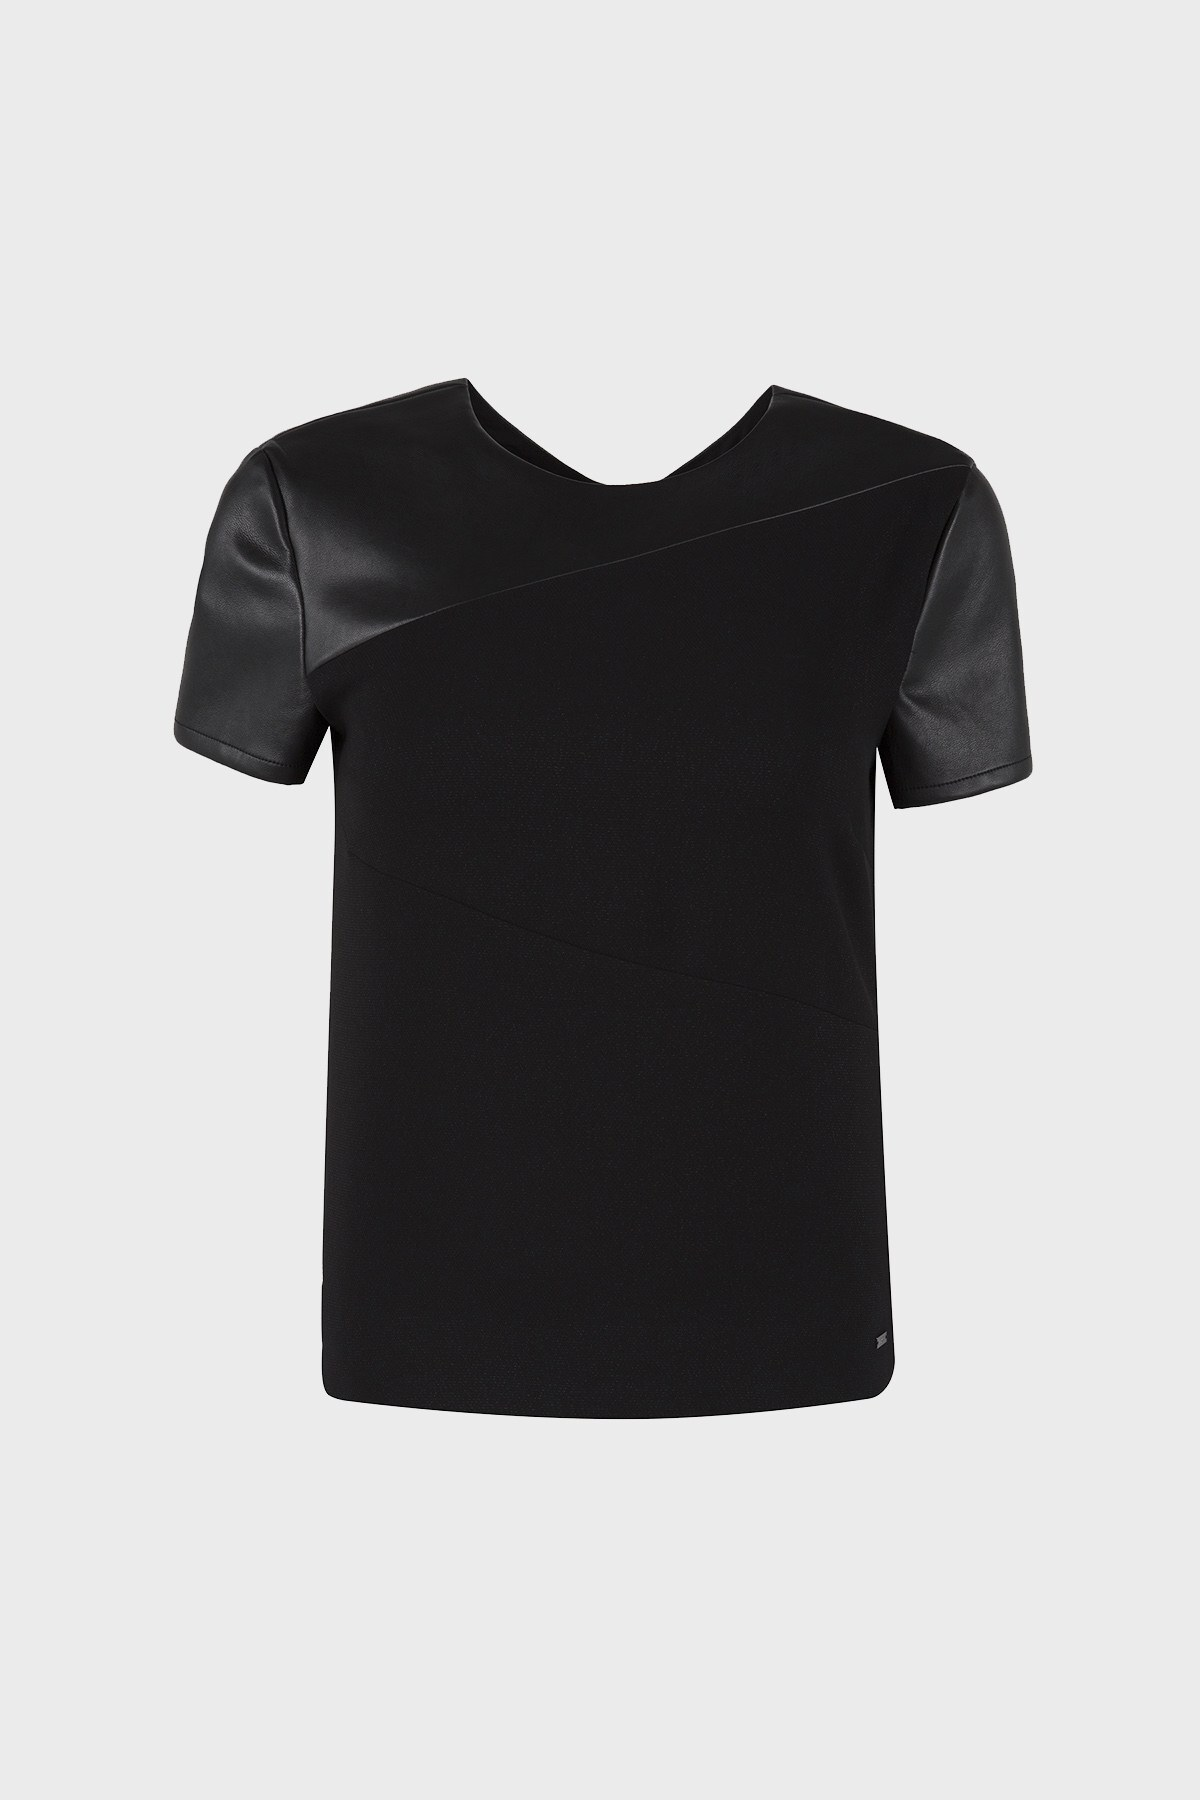 ARMANI EXCHANGE T SHIRT Bayan T Shirt 6ZYH09 YNFMZ 1200 SİYAH